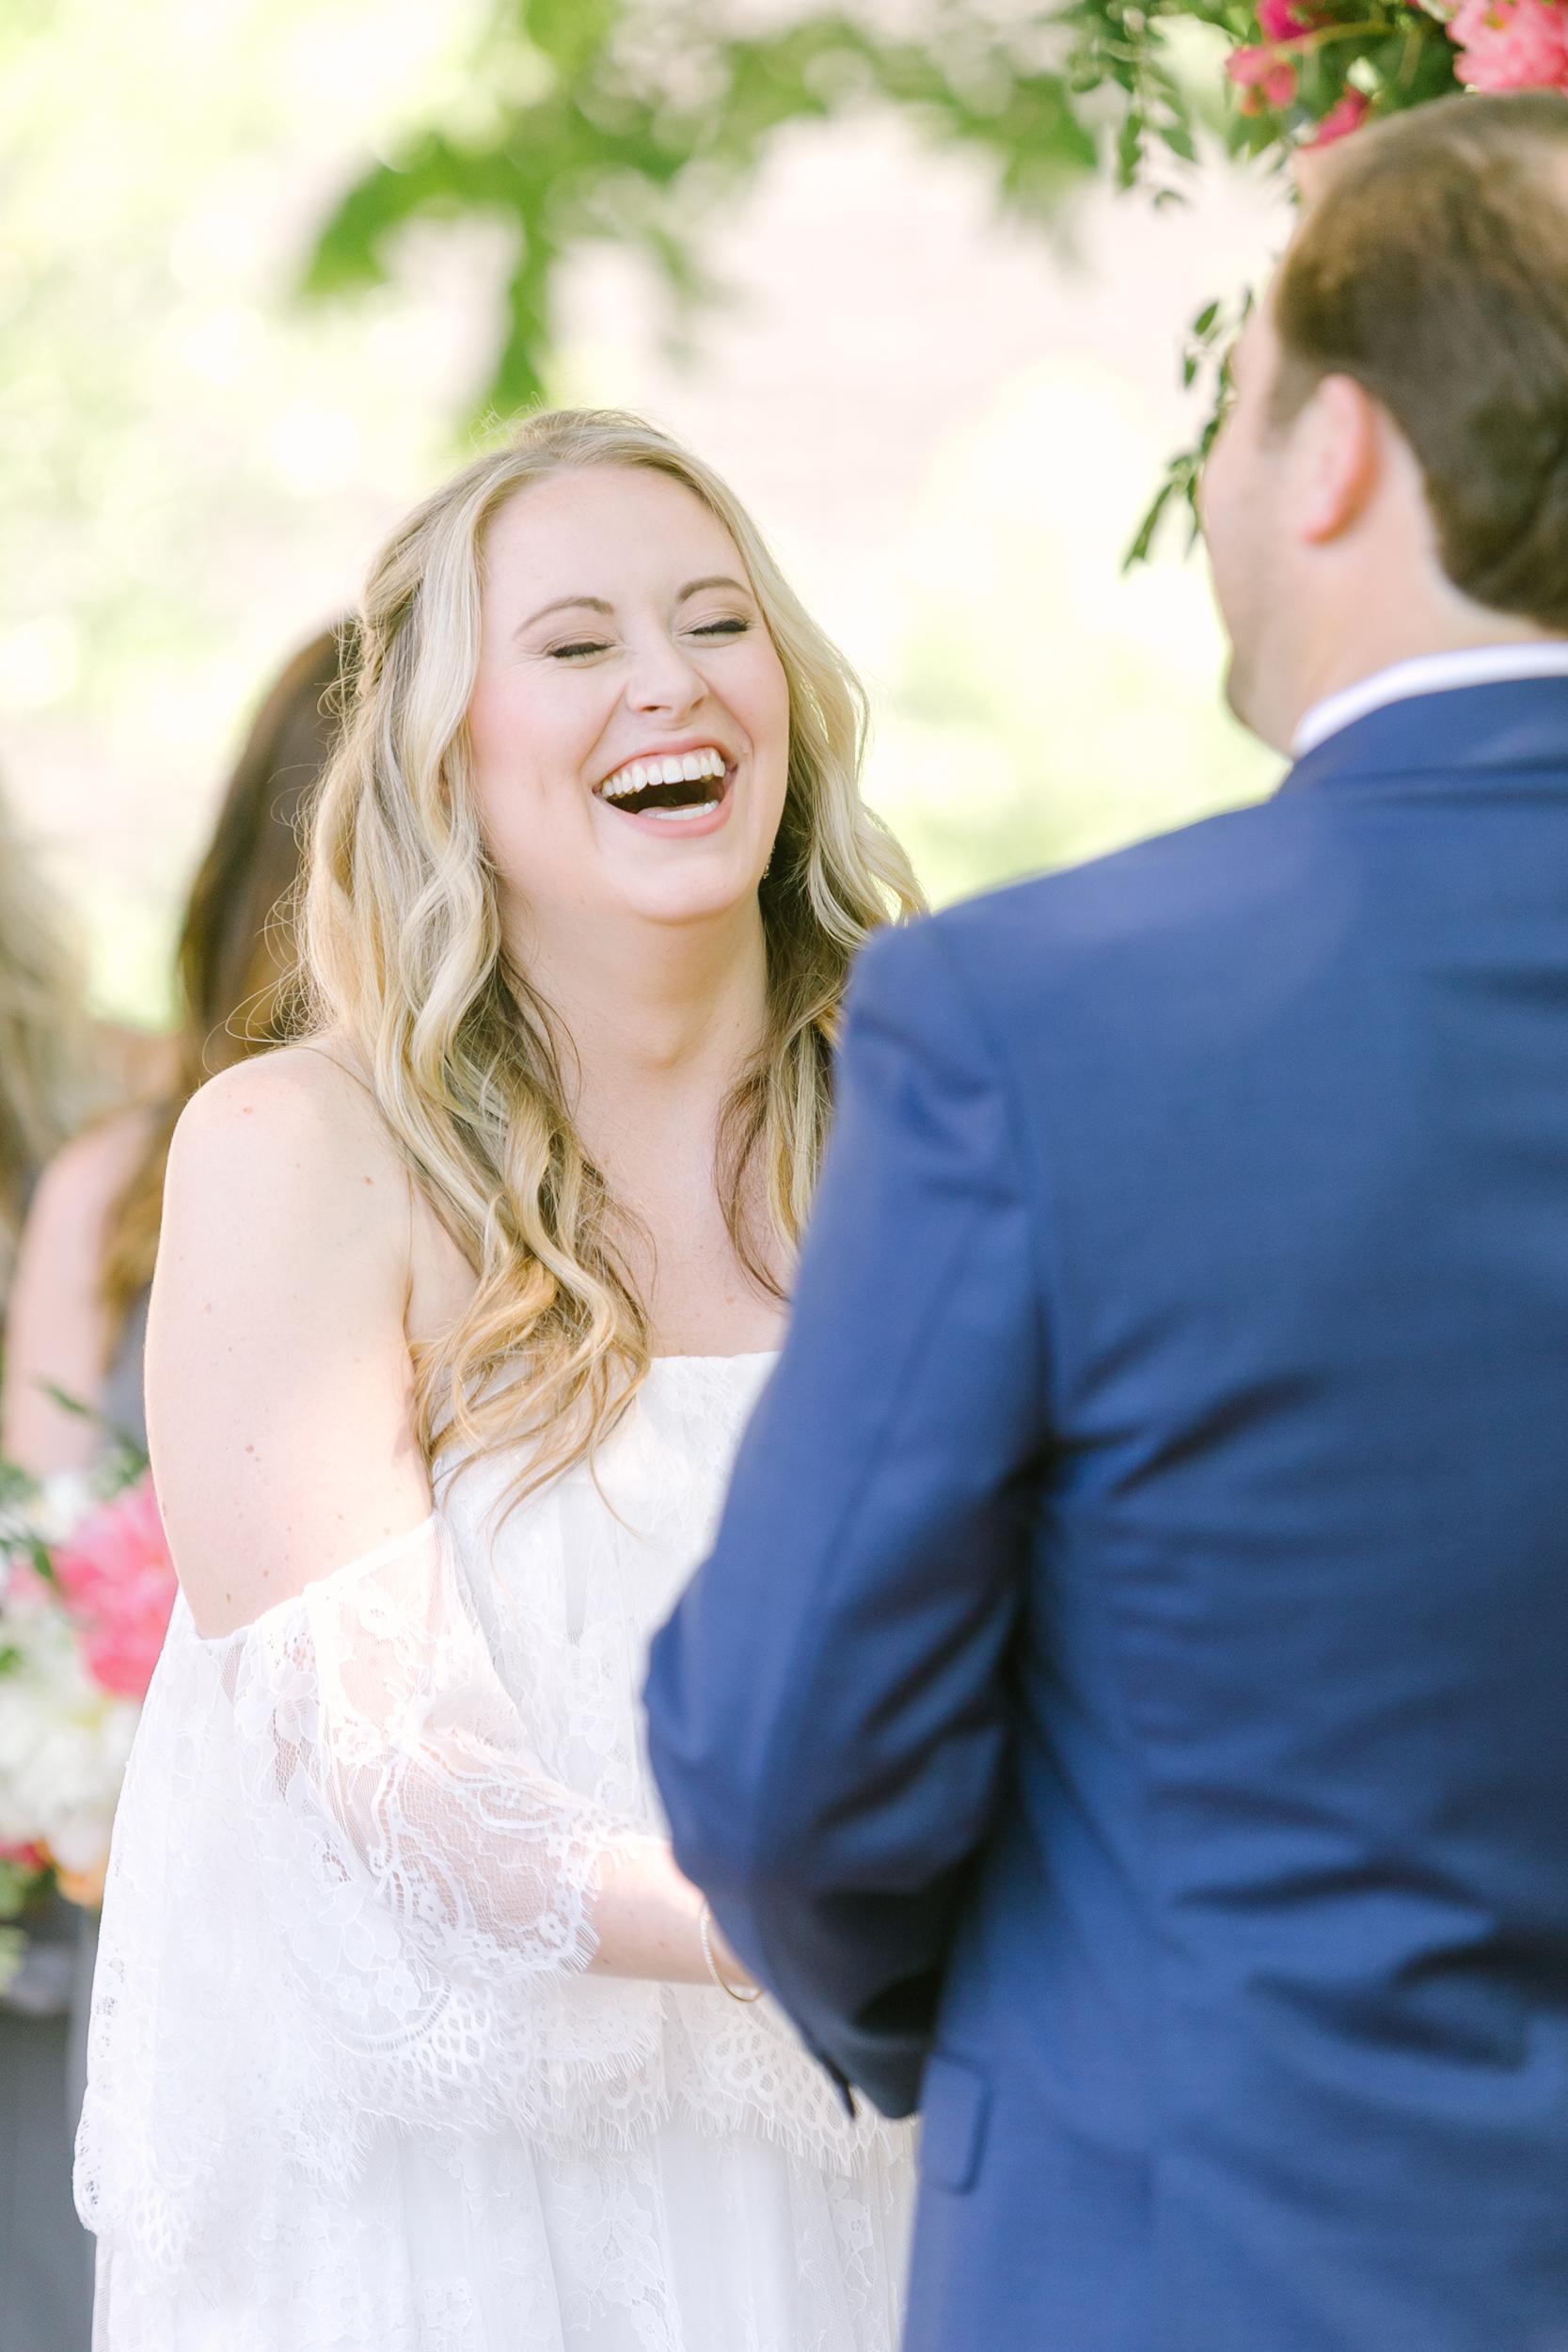 Austin_Wedding_Photographer_Kimberly_Brooke_Photographic_032.jpg